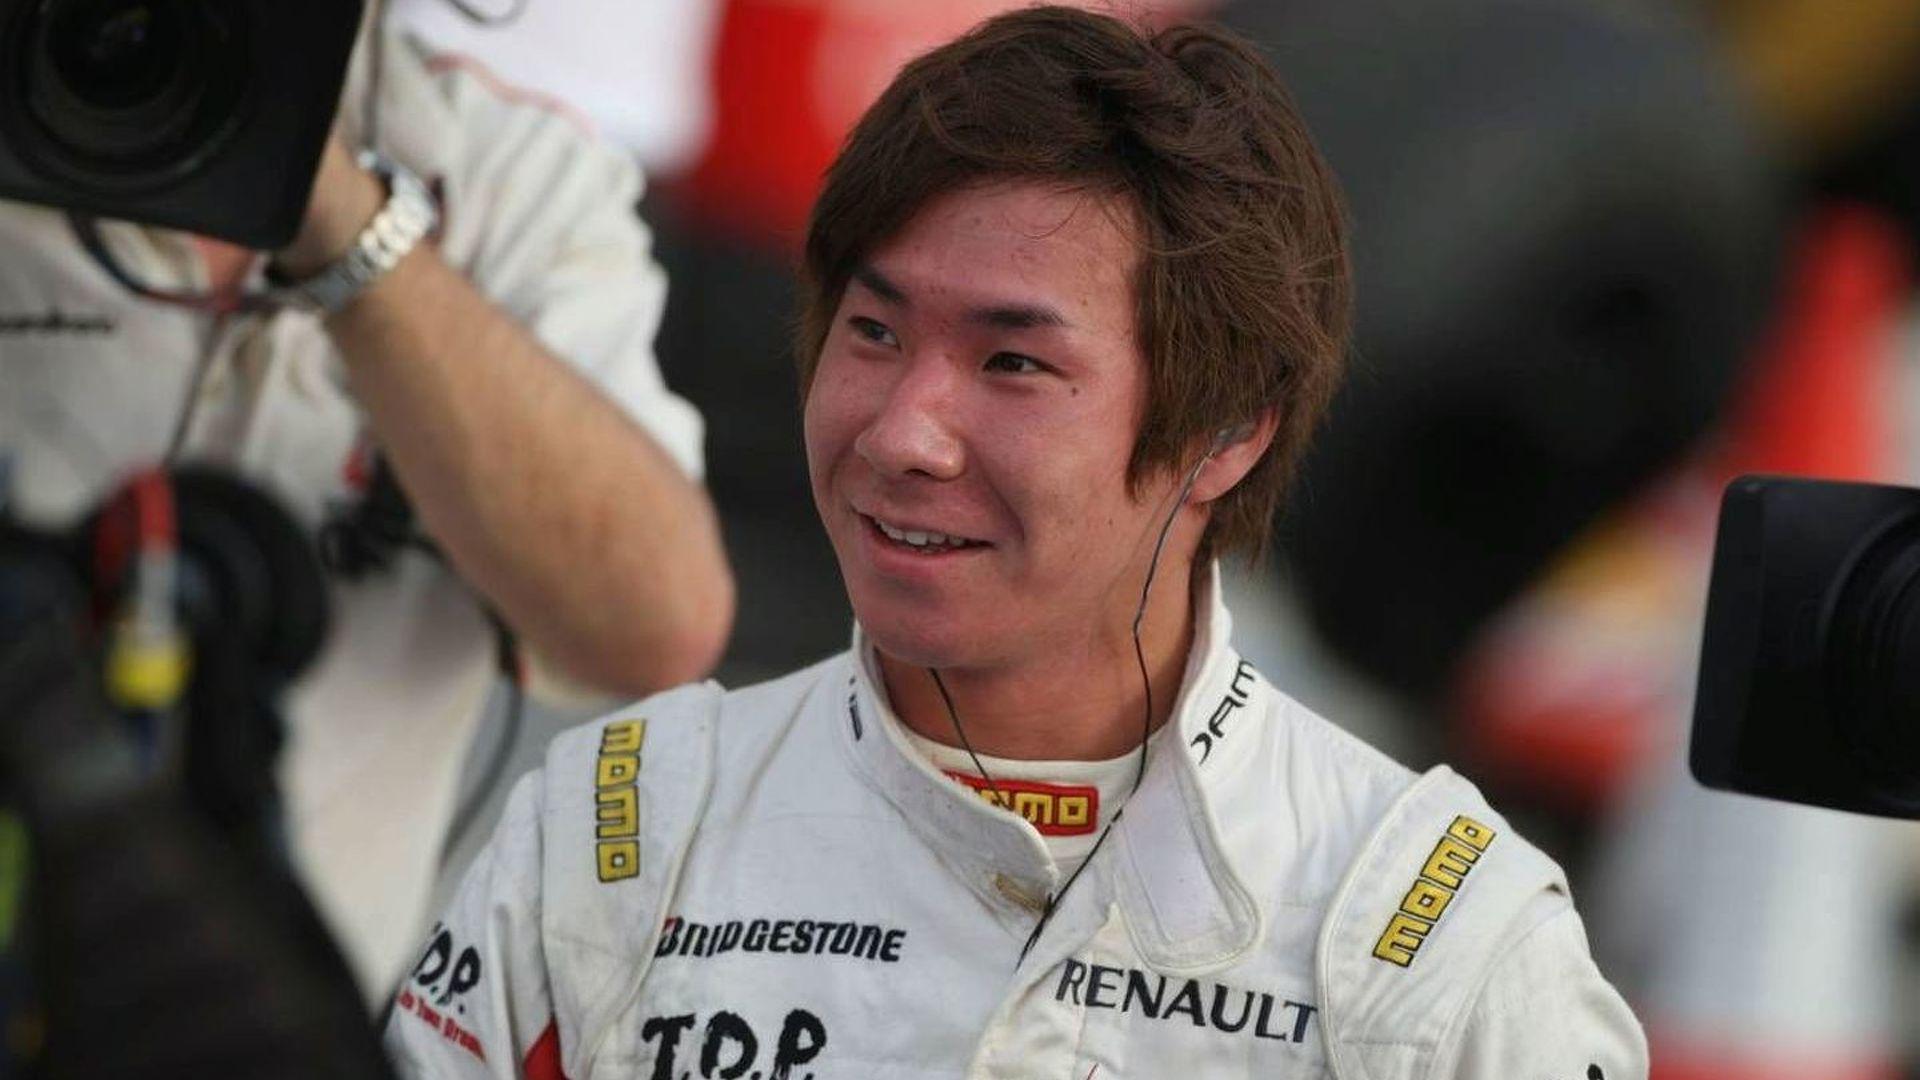 Kobayashi visits Sauber for seat fitting